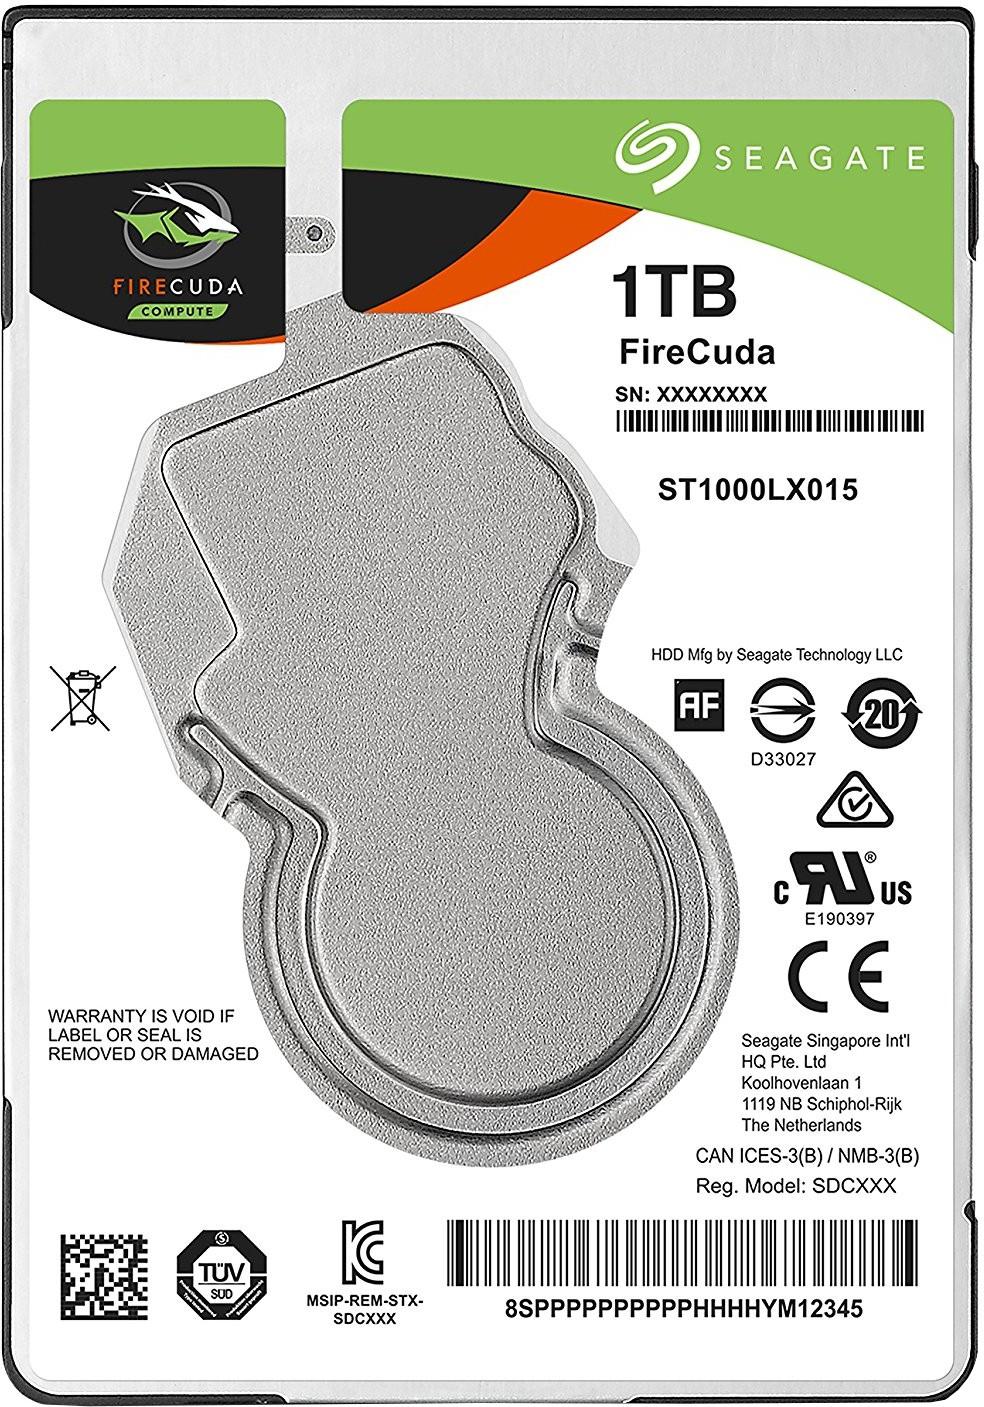 Seagate FireCuda 1 TB Desktop, Surveillance Systems, All in One PCs, Servers Internal Hard Disk Drive (ST1000LX015)